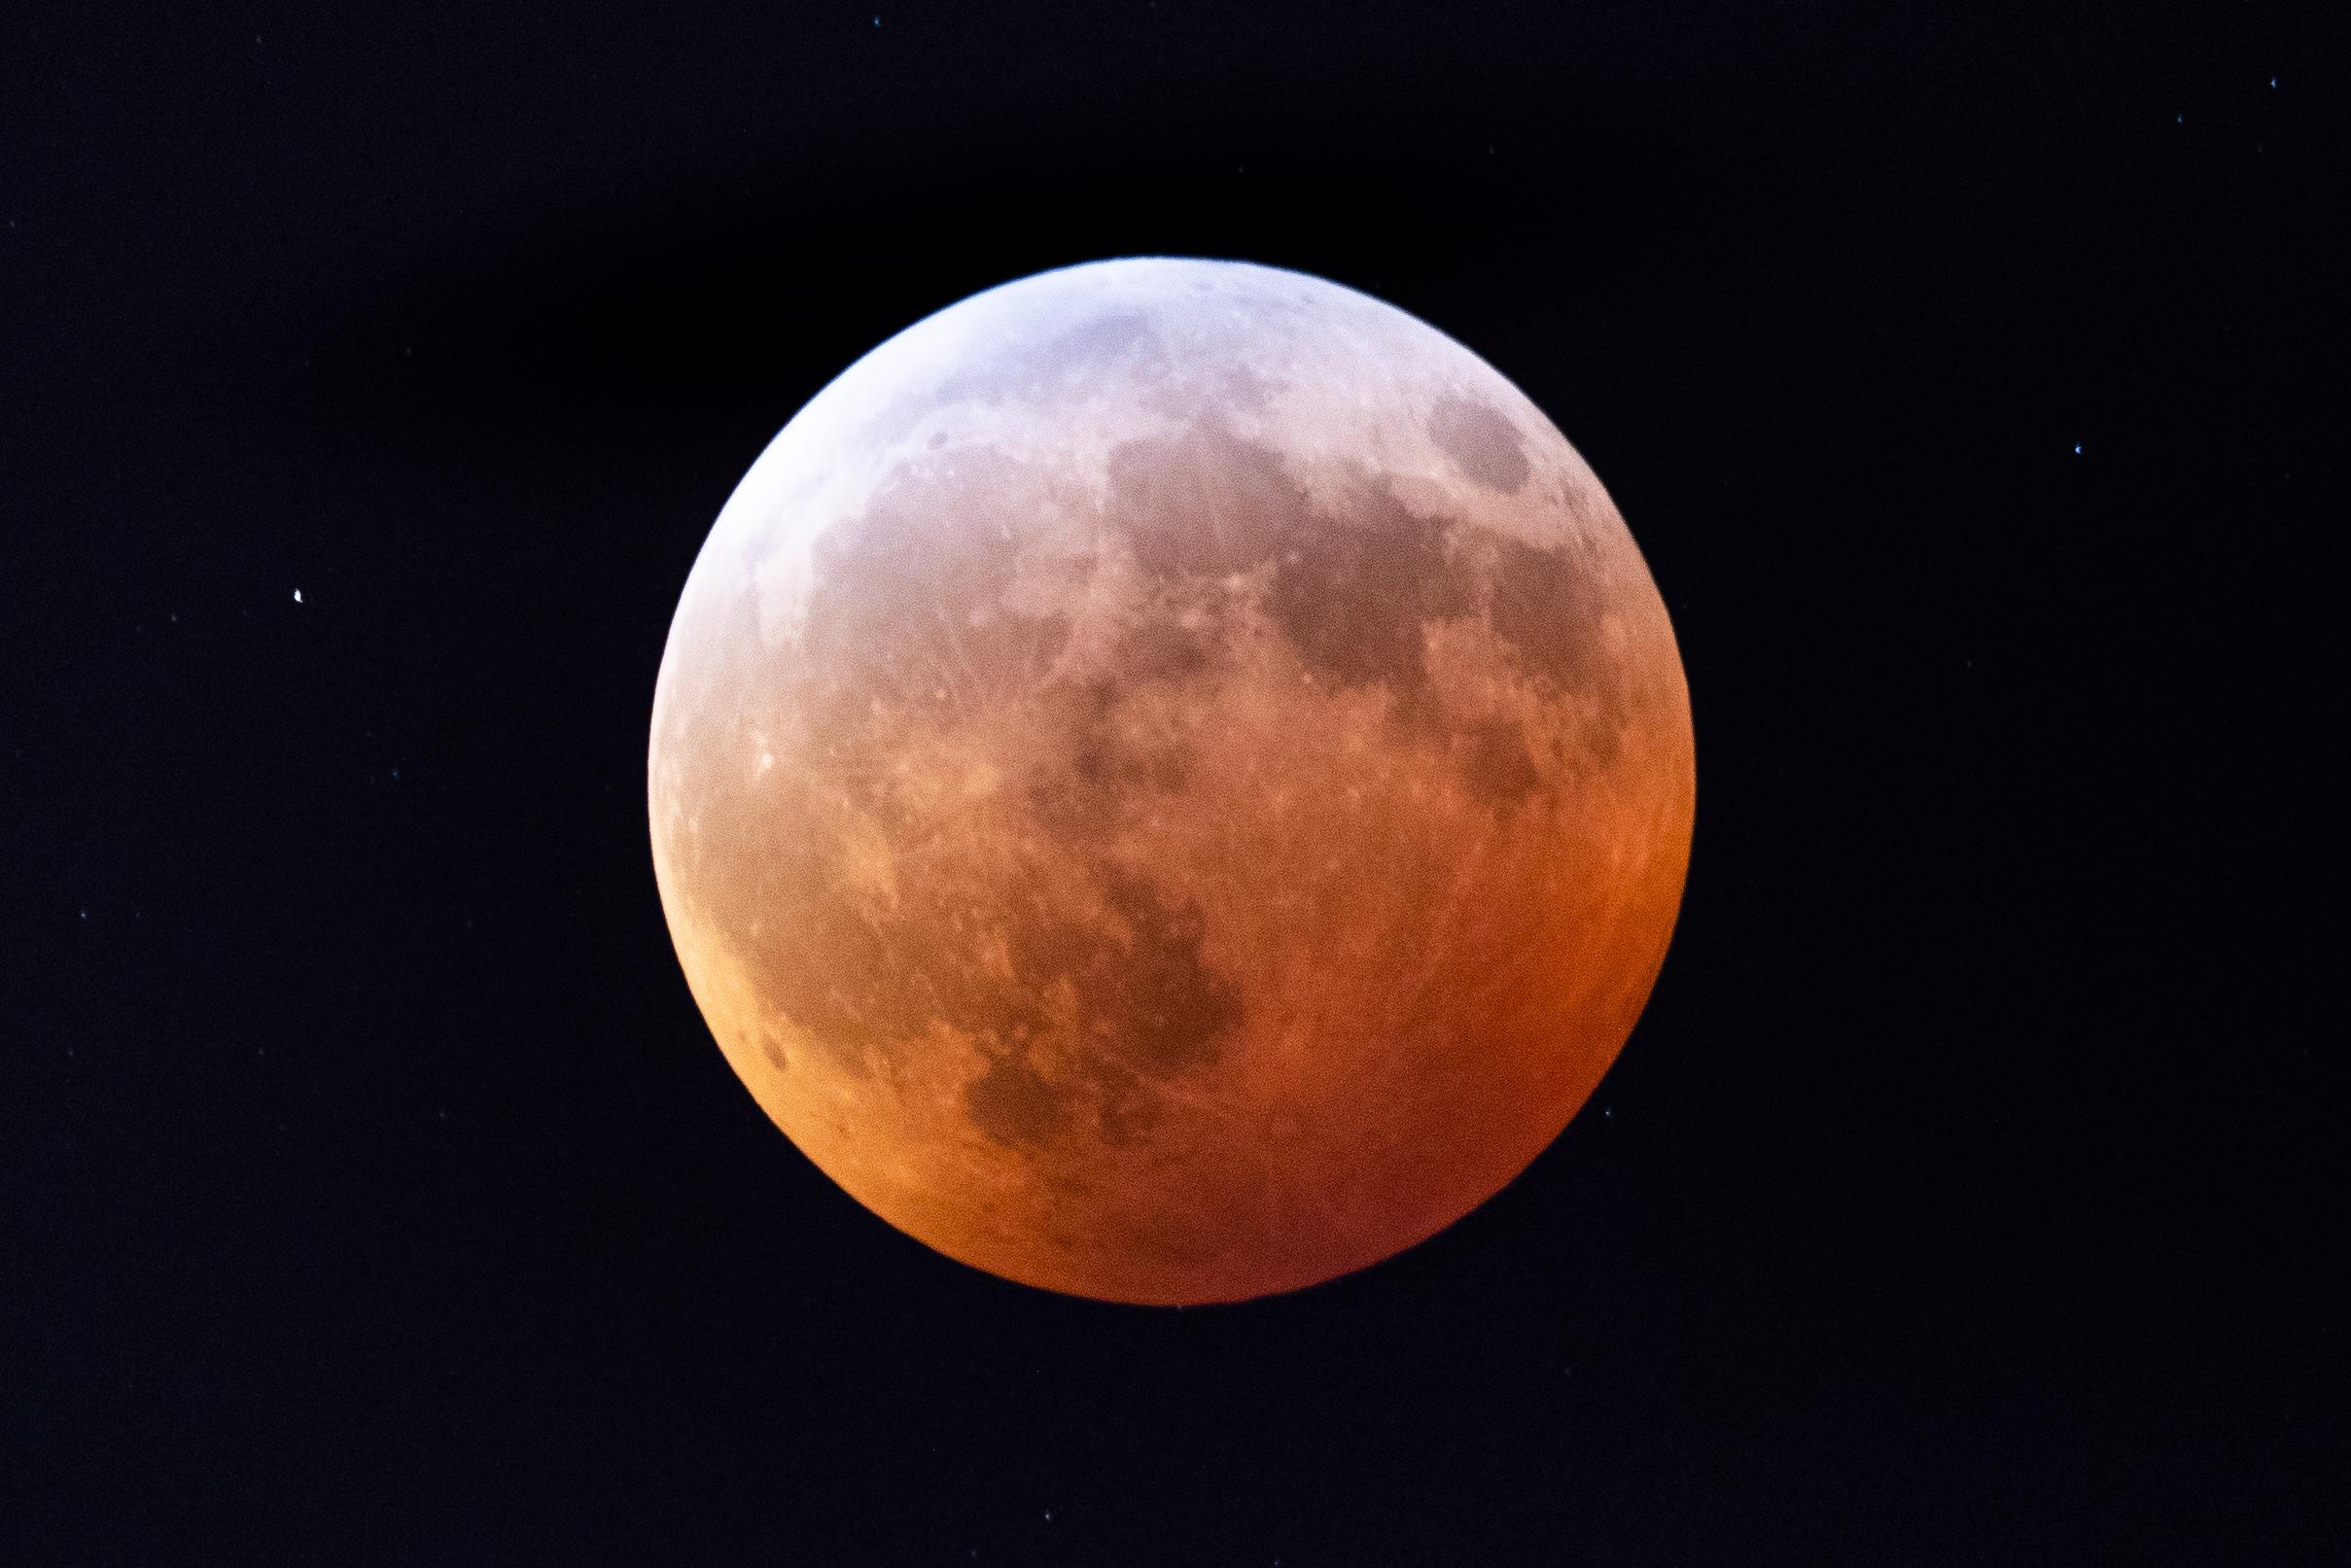 blood moon january 2019 south florida - photo #22